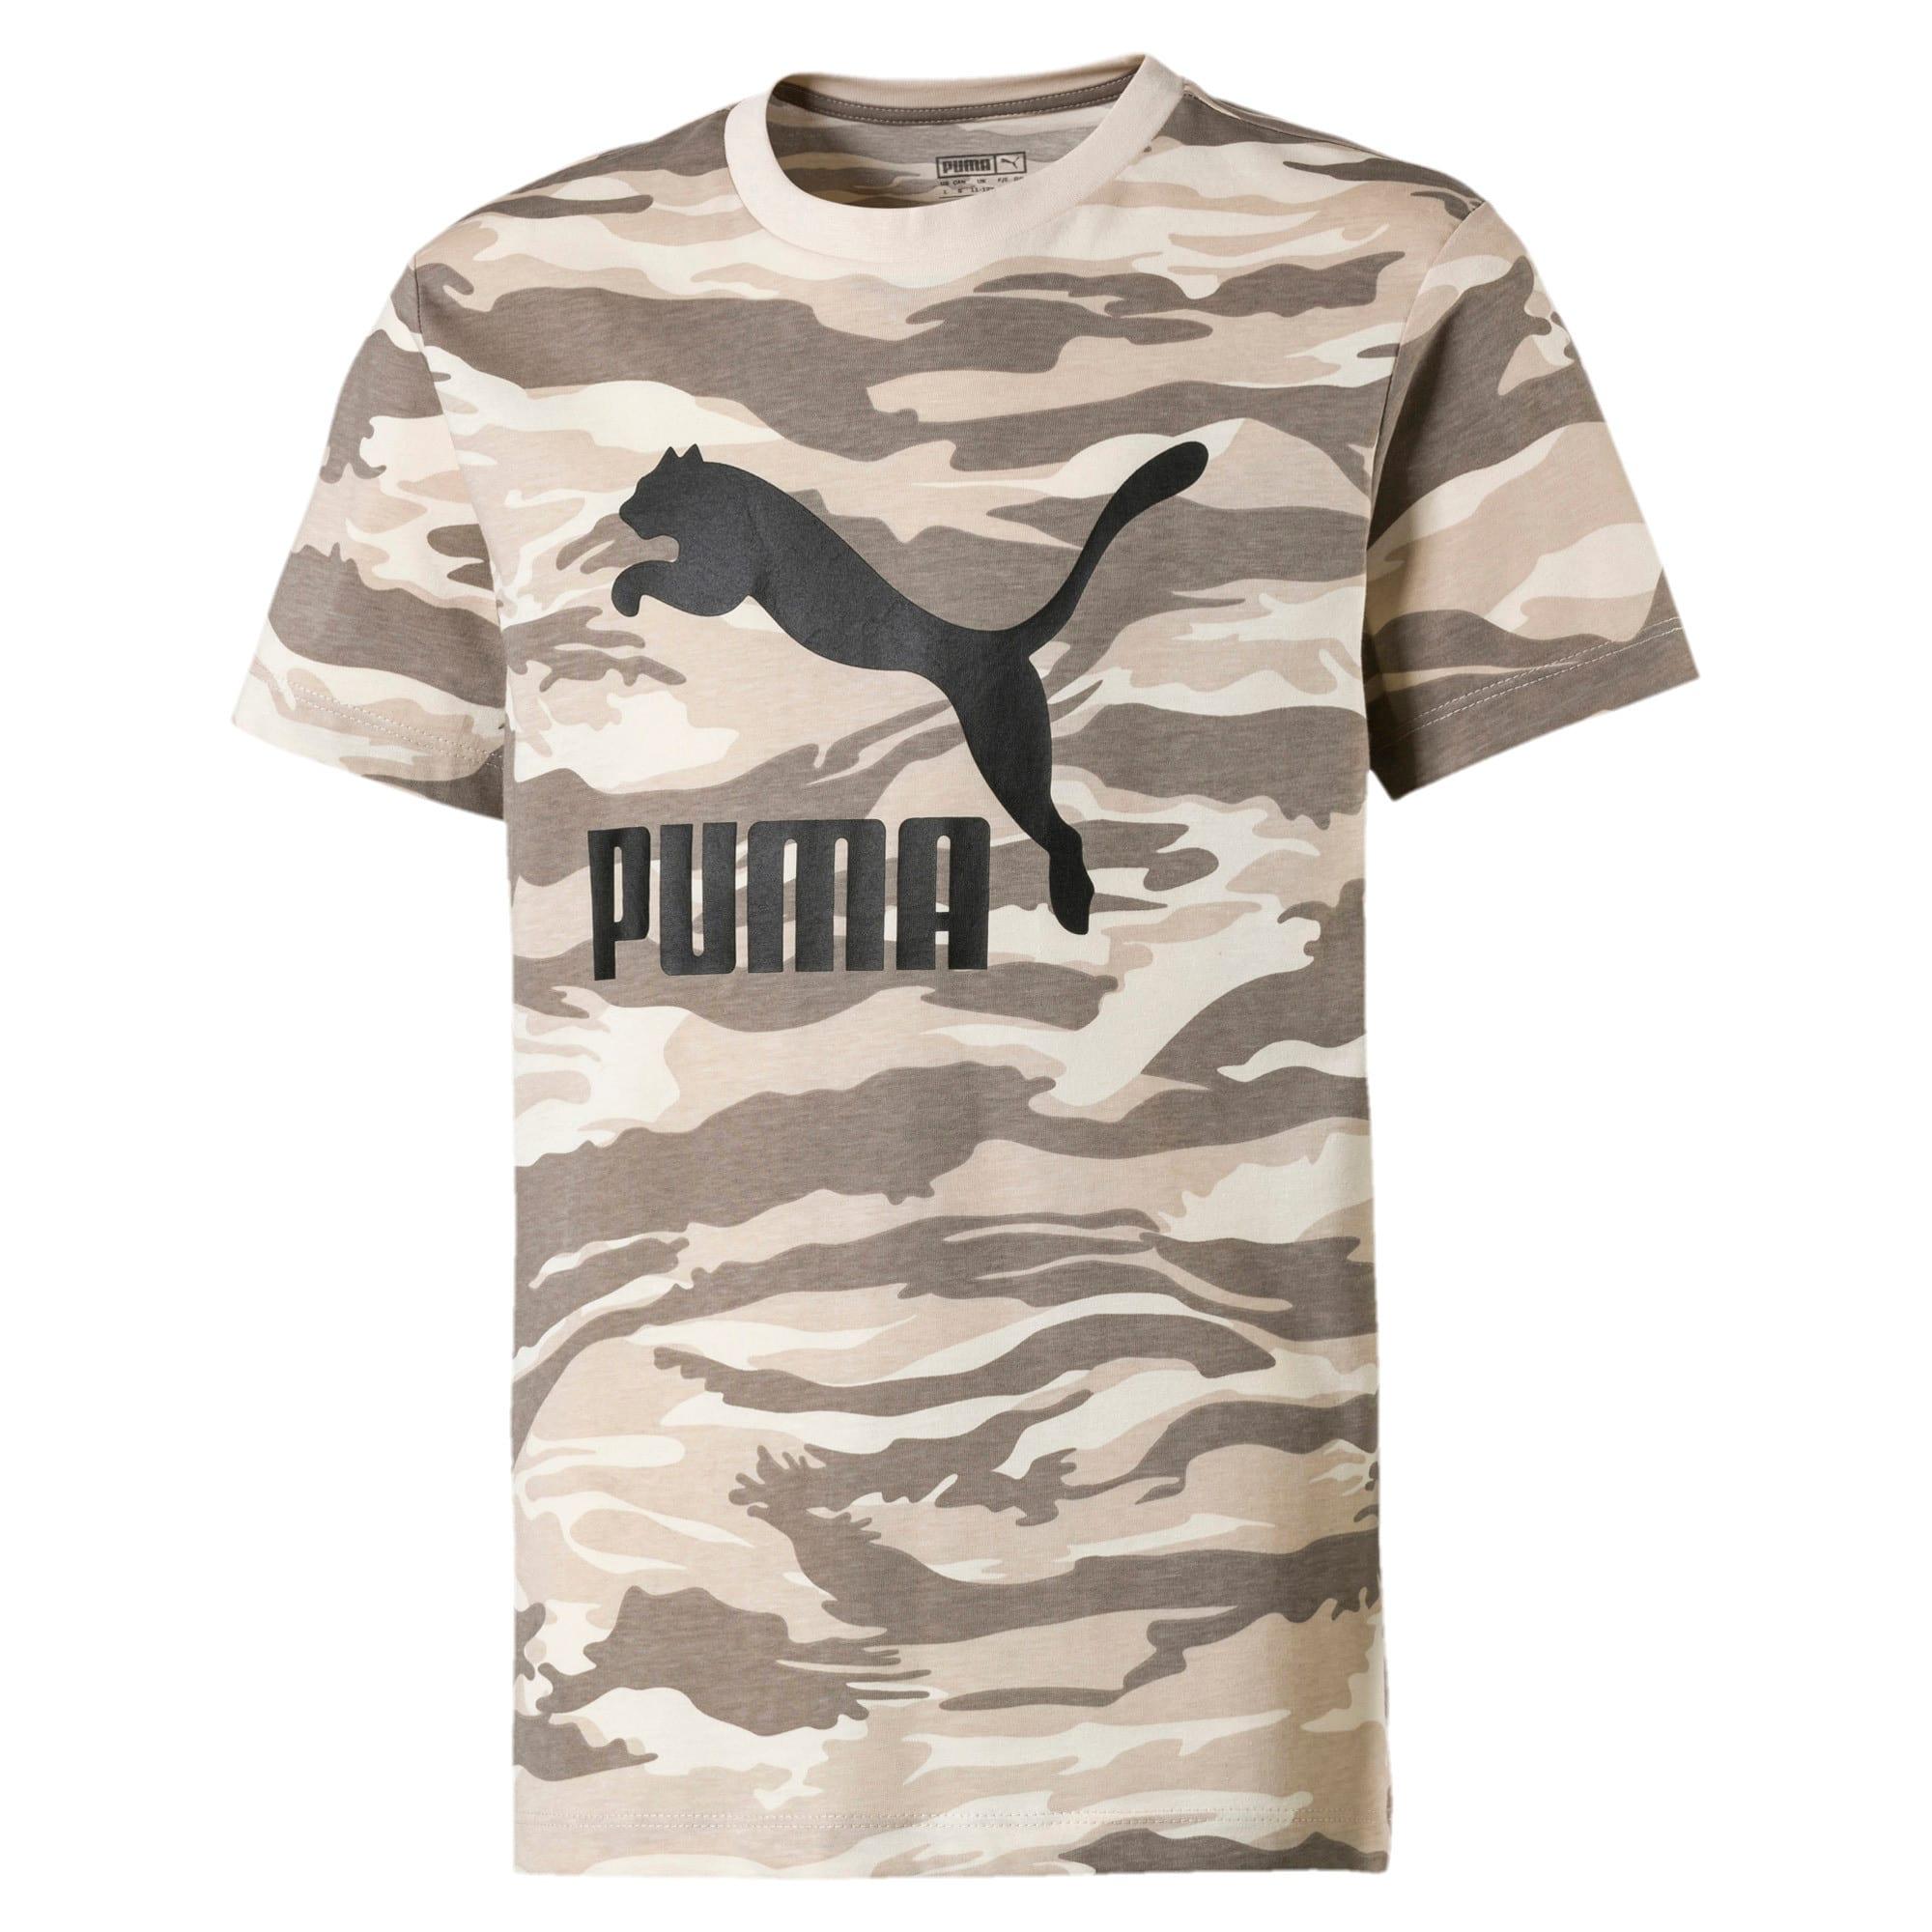 Thumbnail 1 of Streetwear T-shirt met camouflage voor kinderen, White Swan-AOP, medium